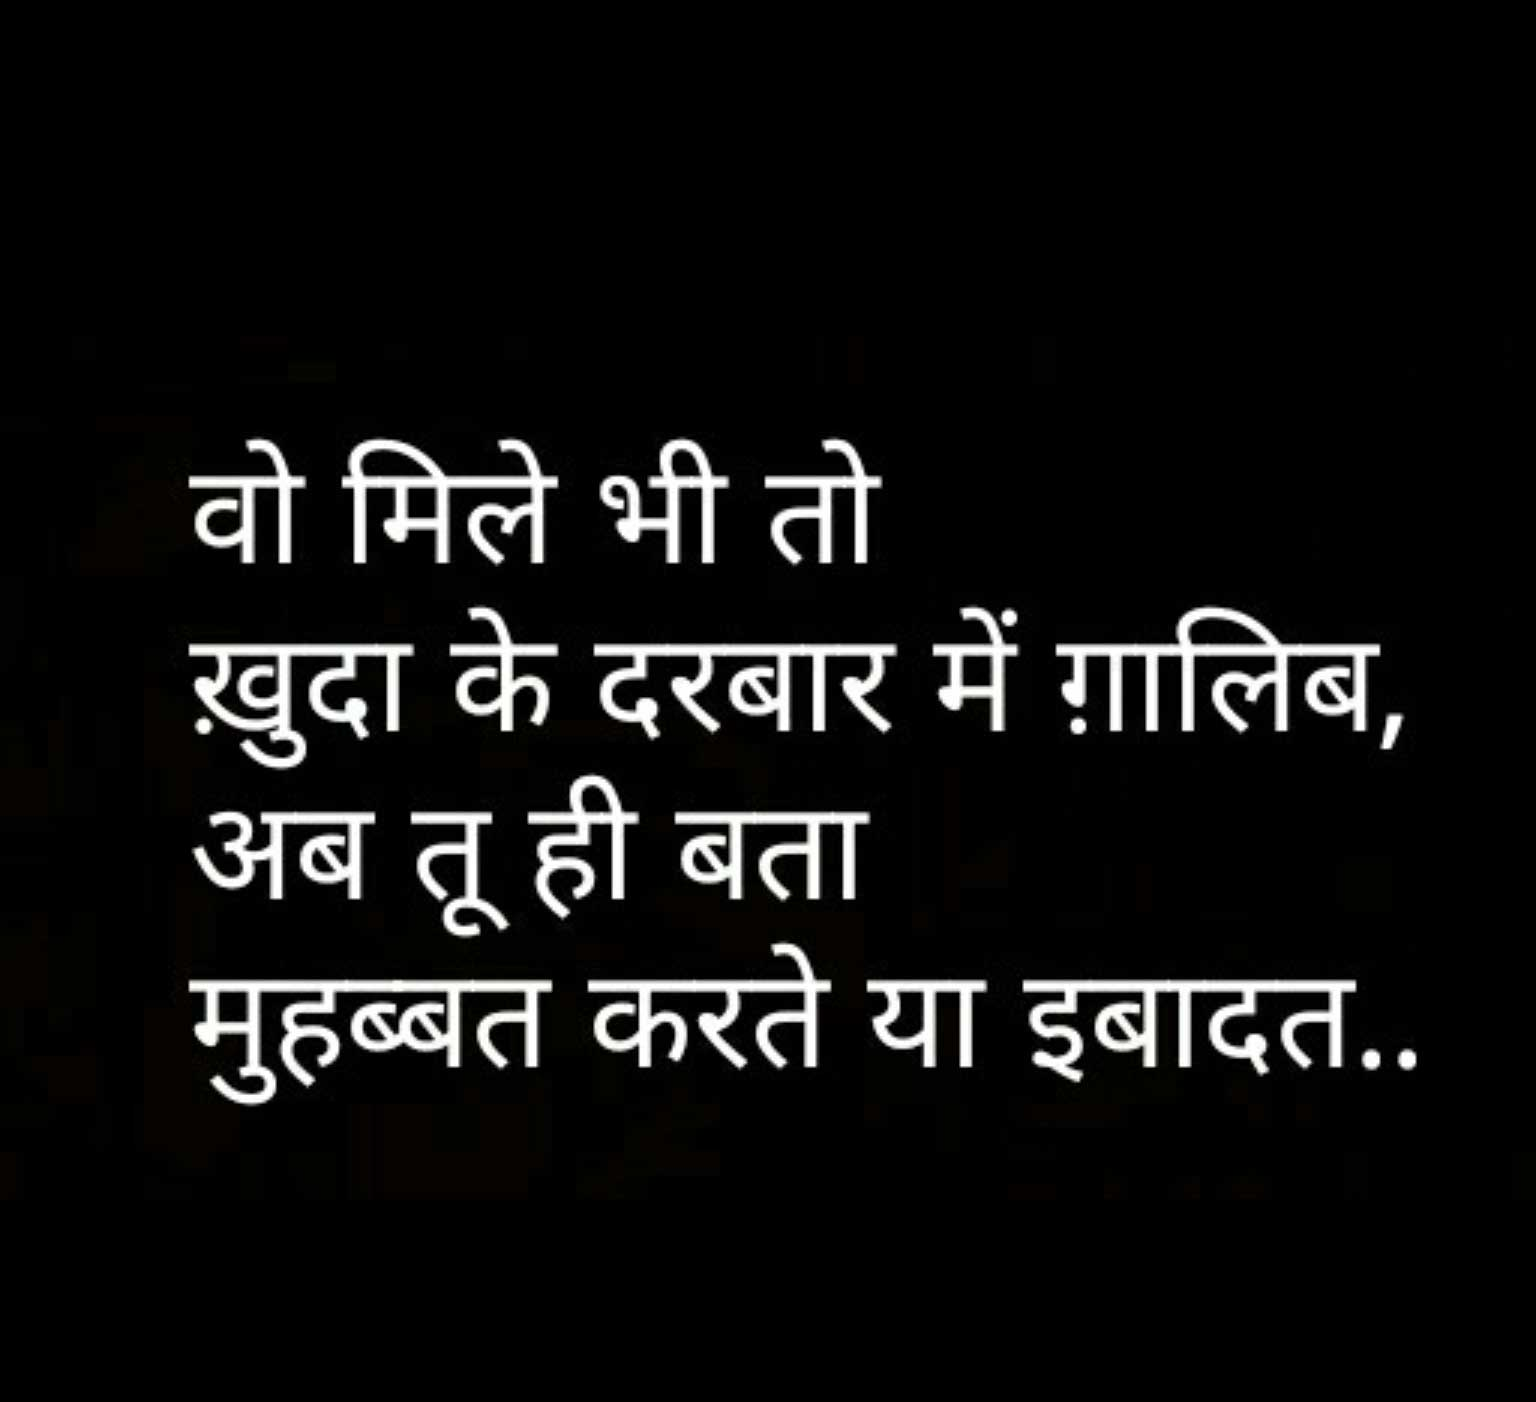 Best Quality Hindi Boys Attitude Wallpaper